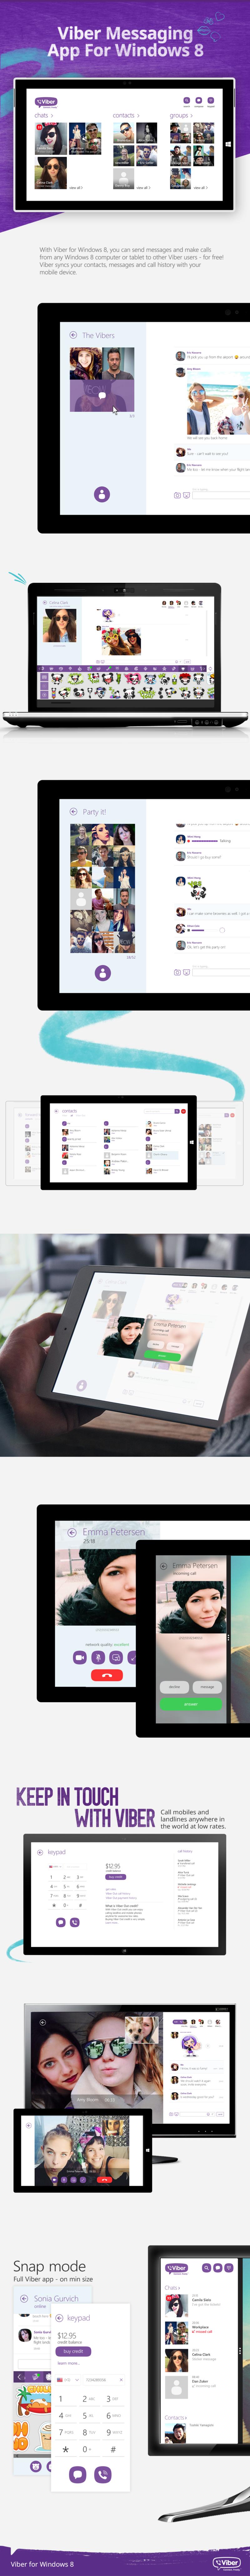 Viber for Metro - Software Design